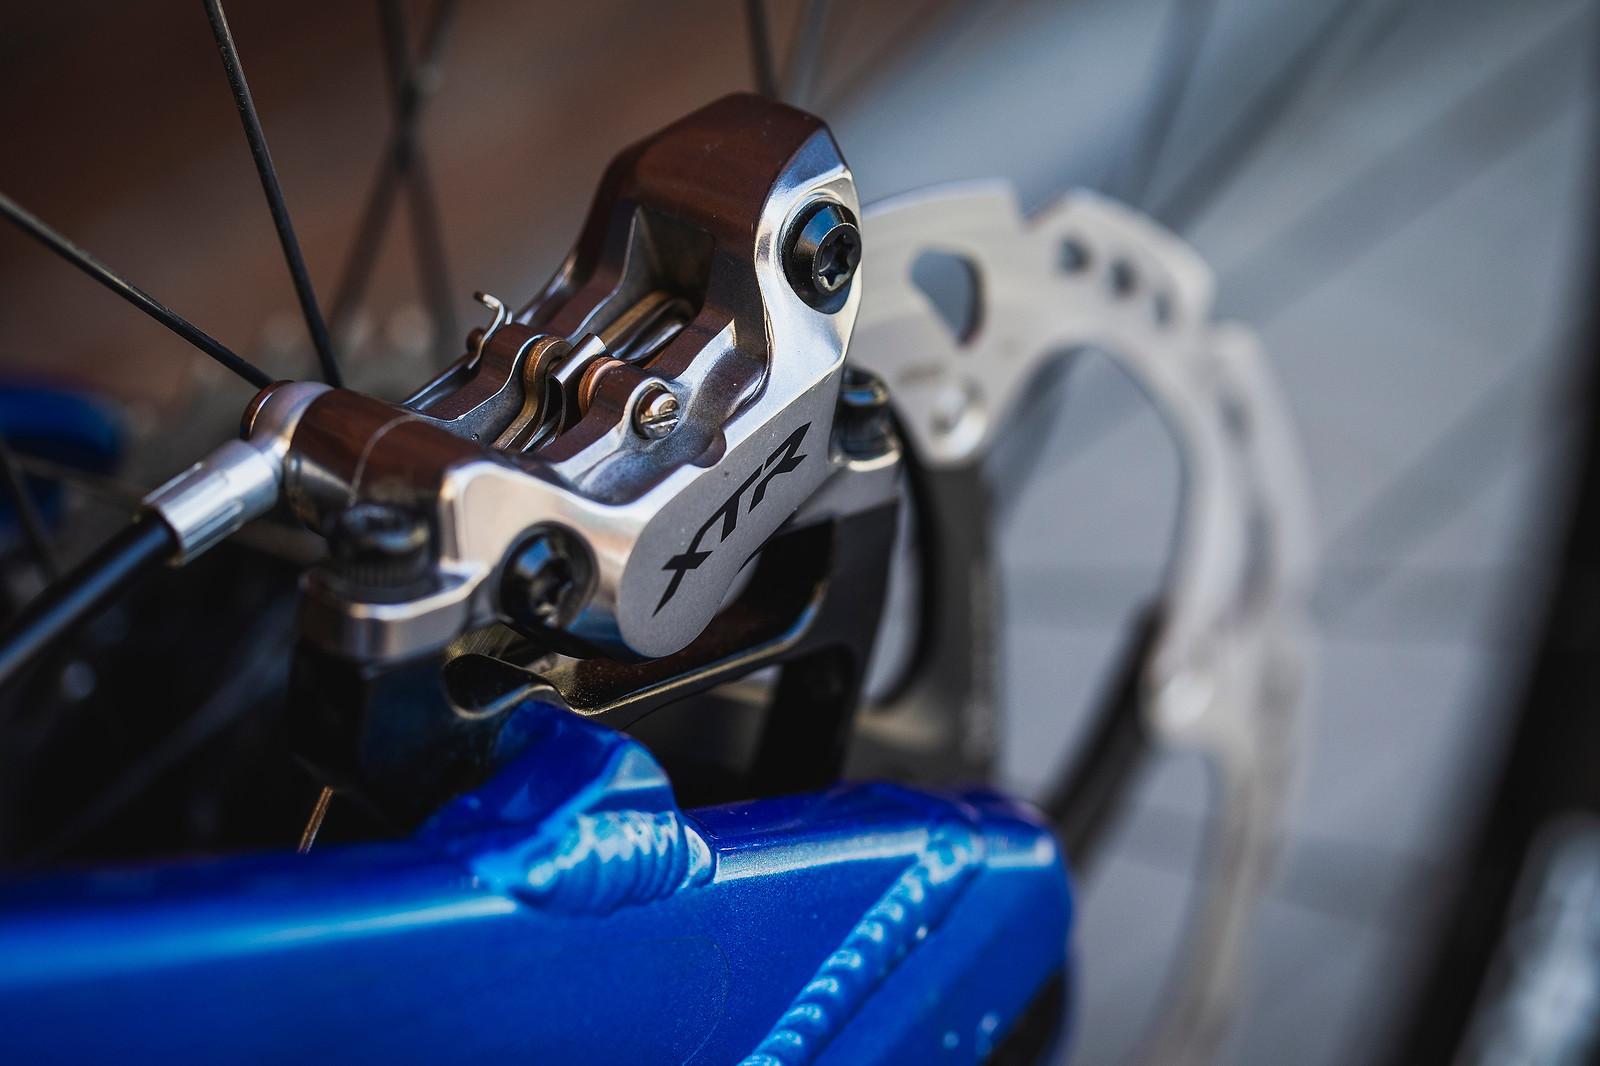 Shimano XTR Brakes - Pro Bike Check - George Brannigan's GT Fury - Mountain Biking Pictures - Vital MTB